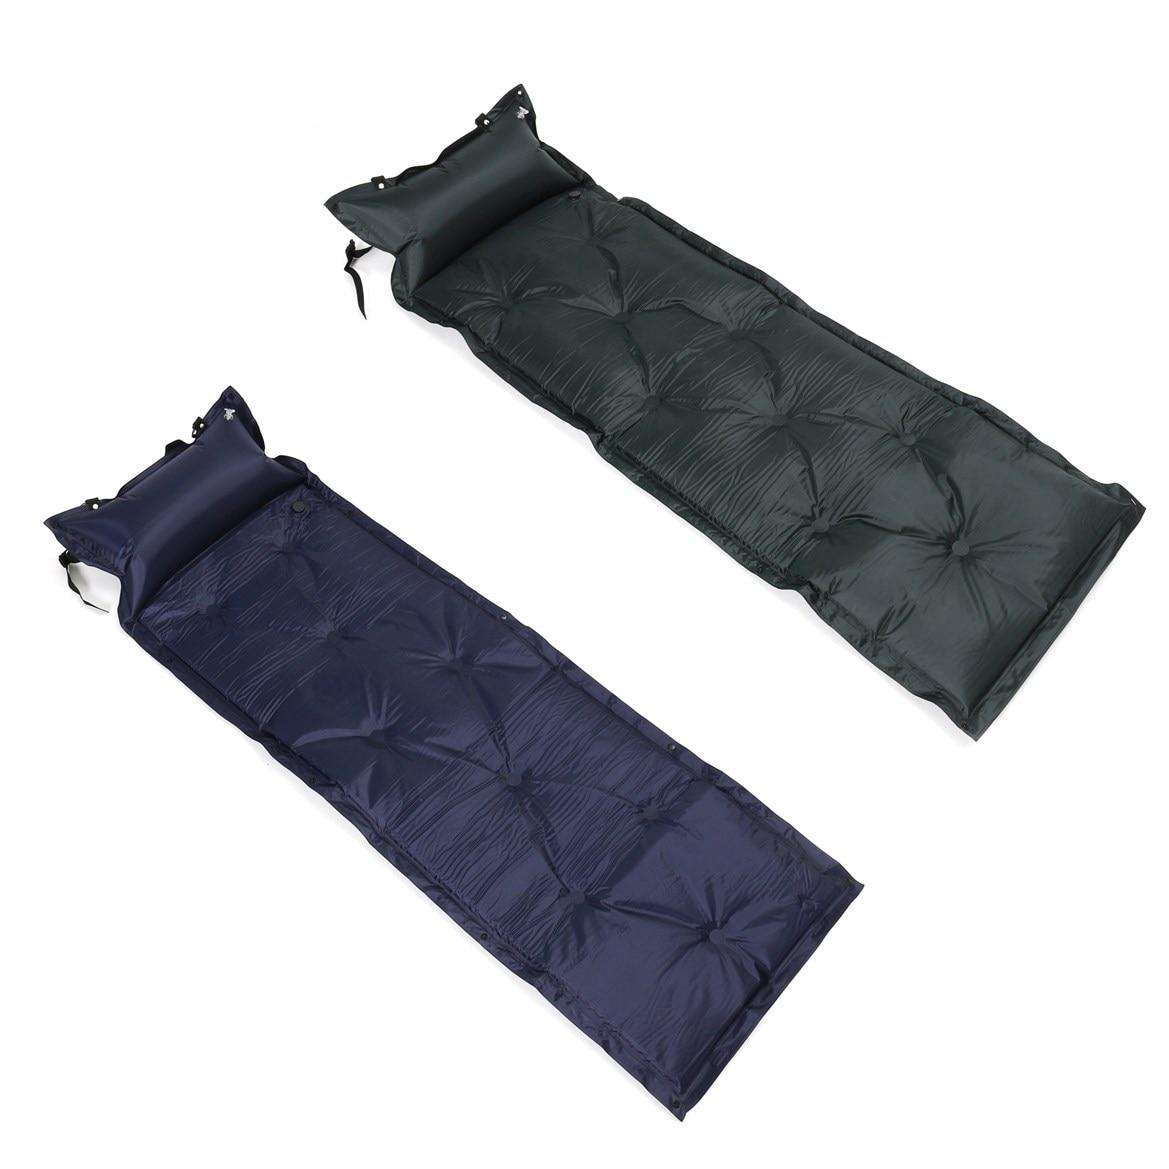 1pcs Self-Inflating Mattress Inflatable Outdoor Bed Pillow Sleeping Pad Air  Mat Mattress Tent Picnic